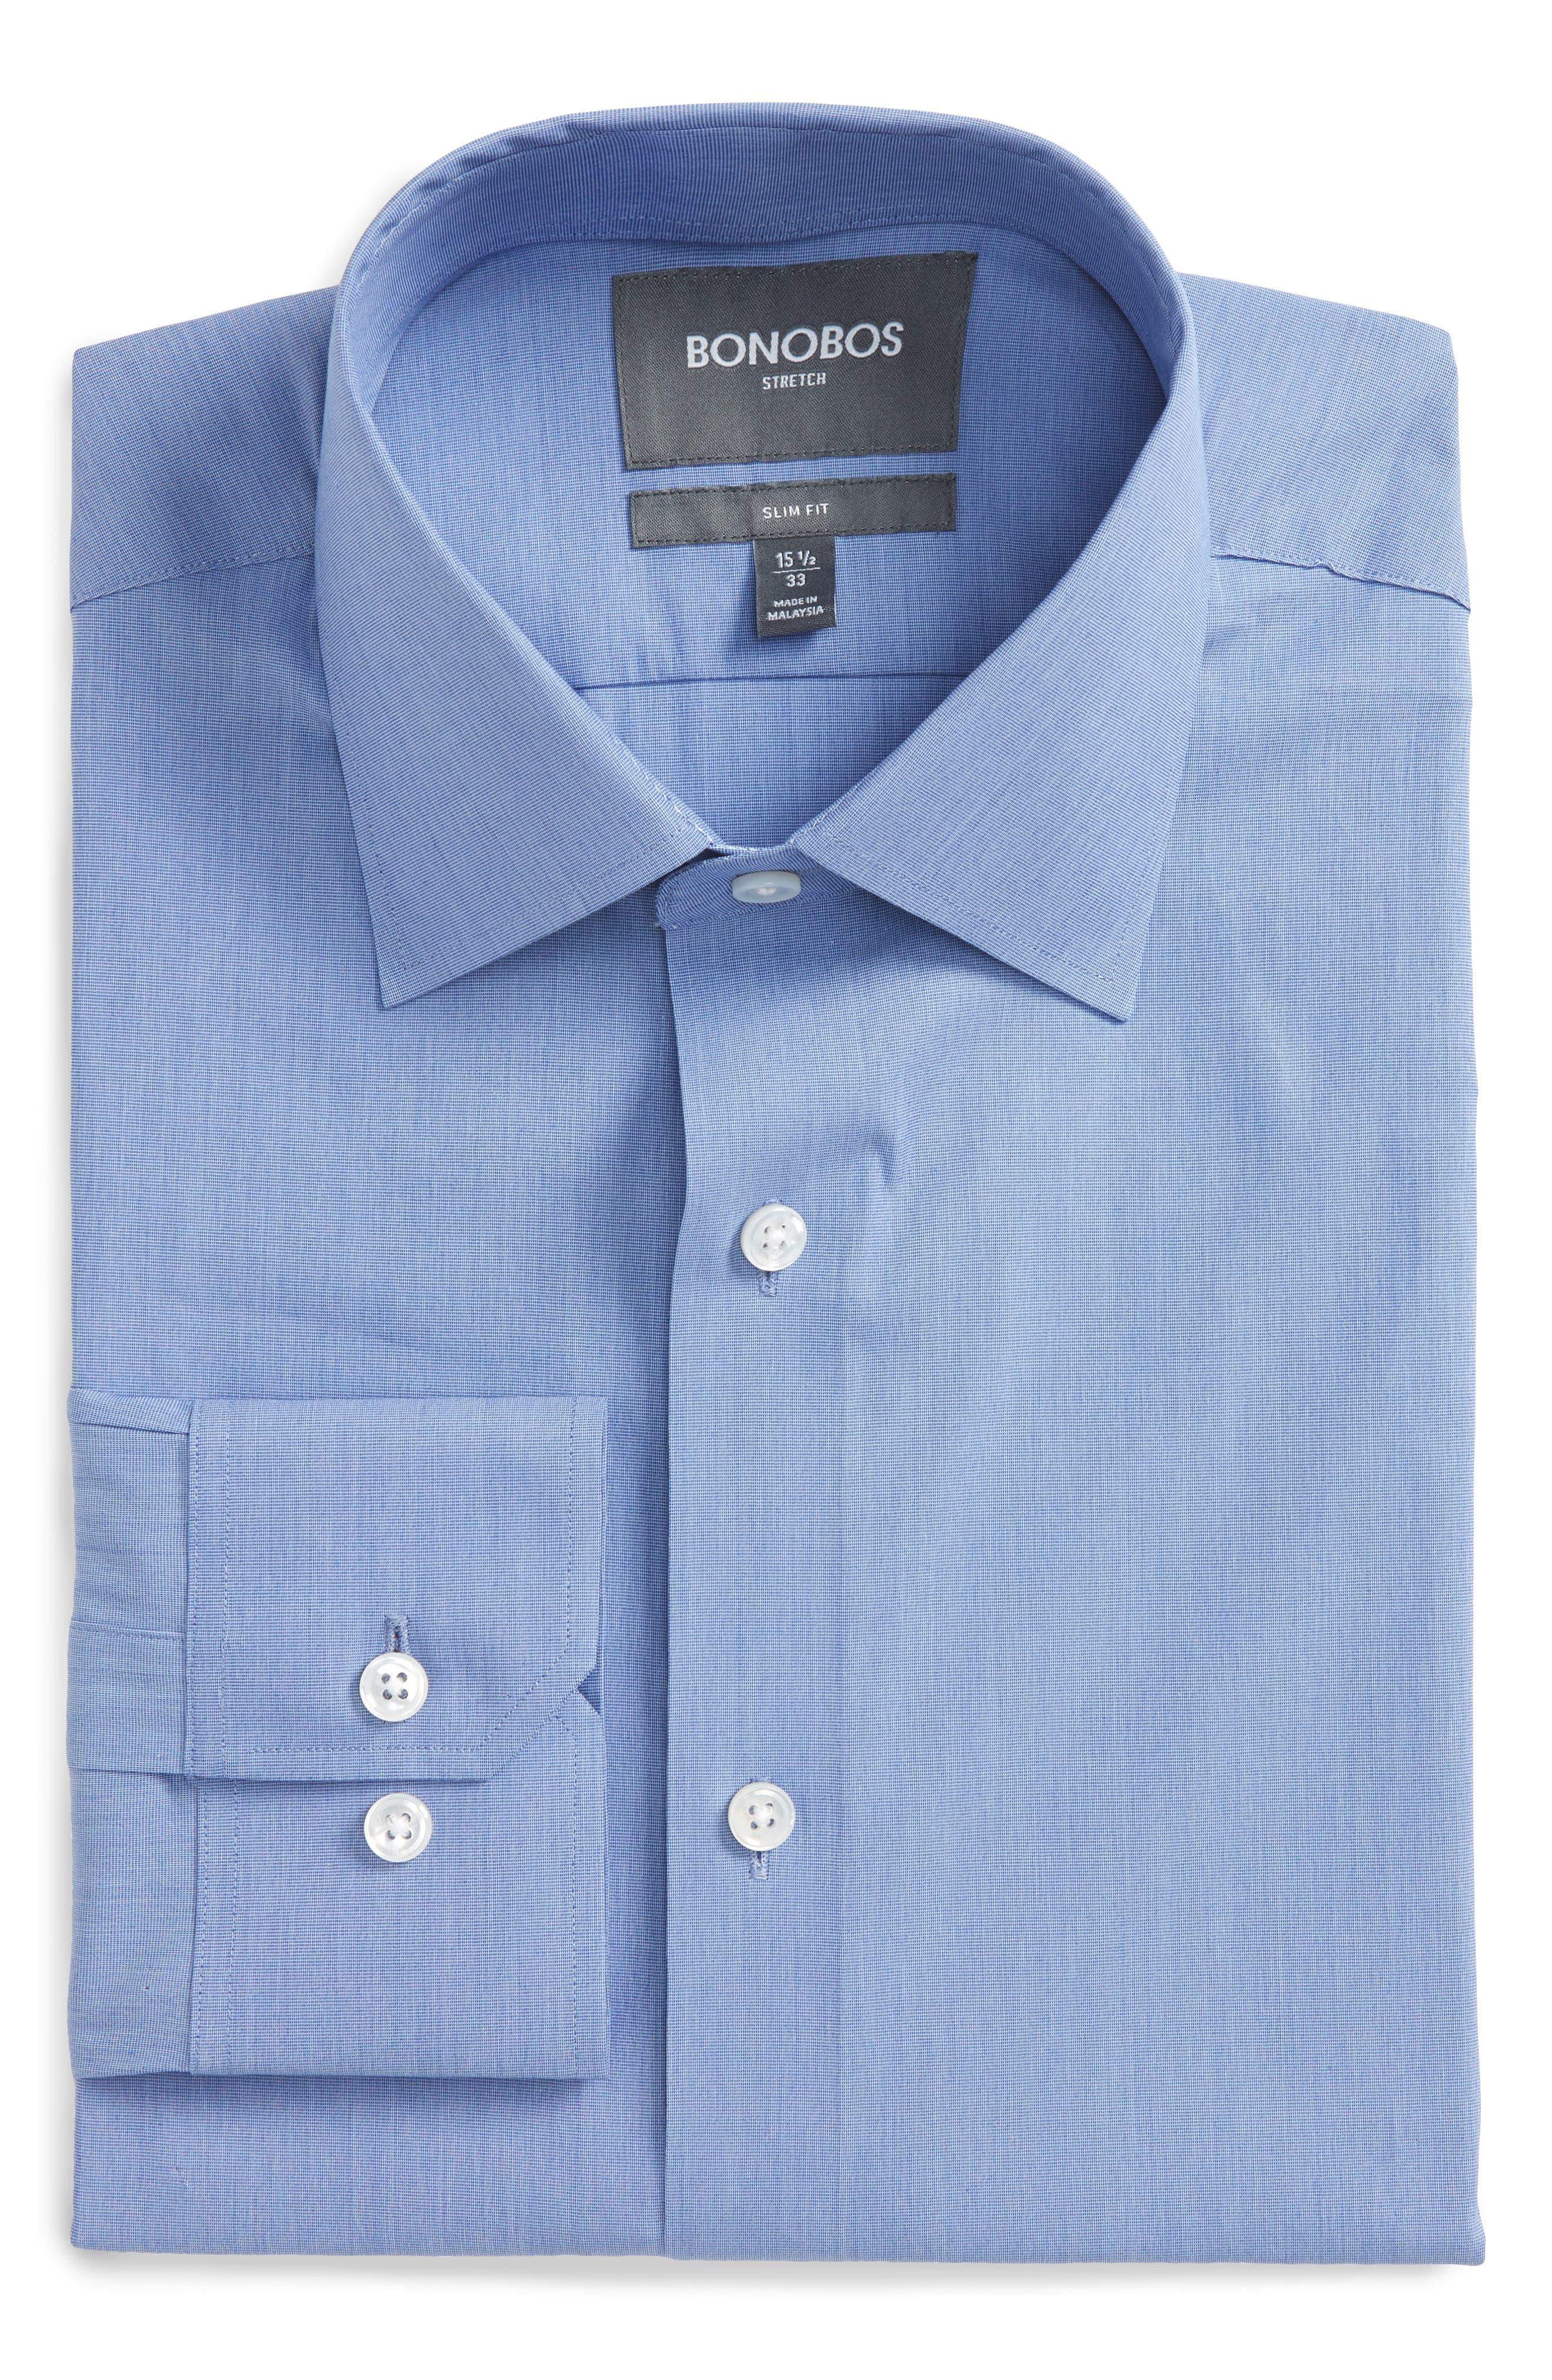 Main Image - Bonobos Jetsetter Slim Fit Solid Dress Shirt